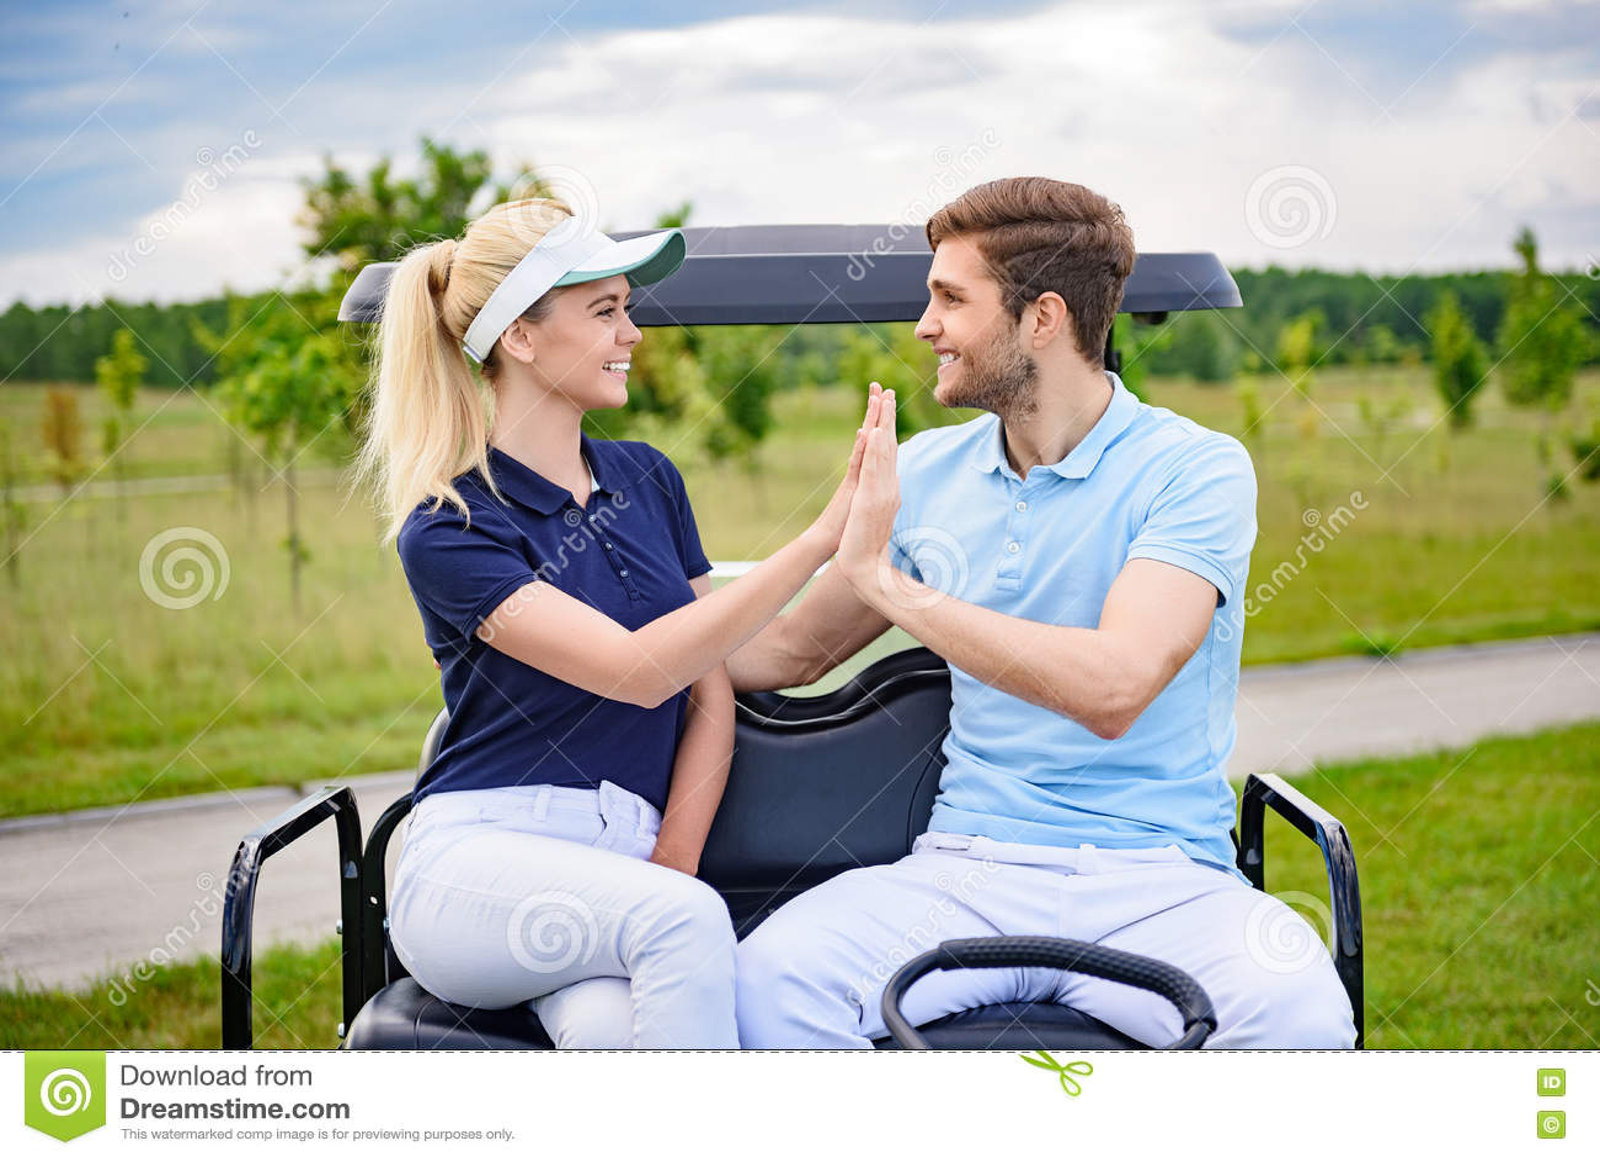 Consider, thumb down golf speaking